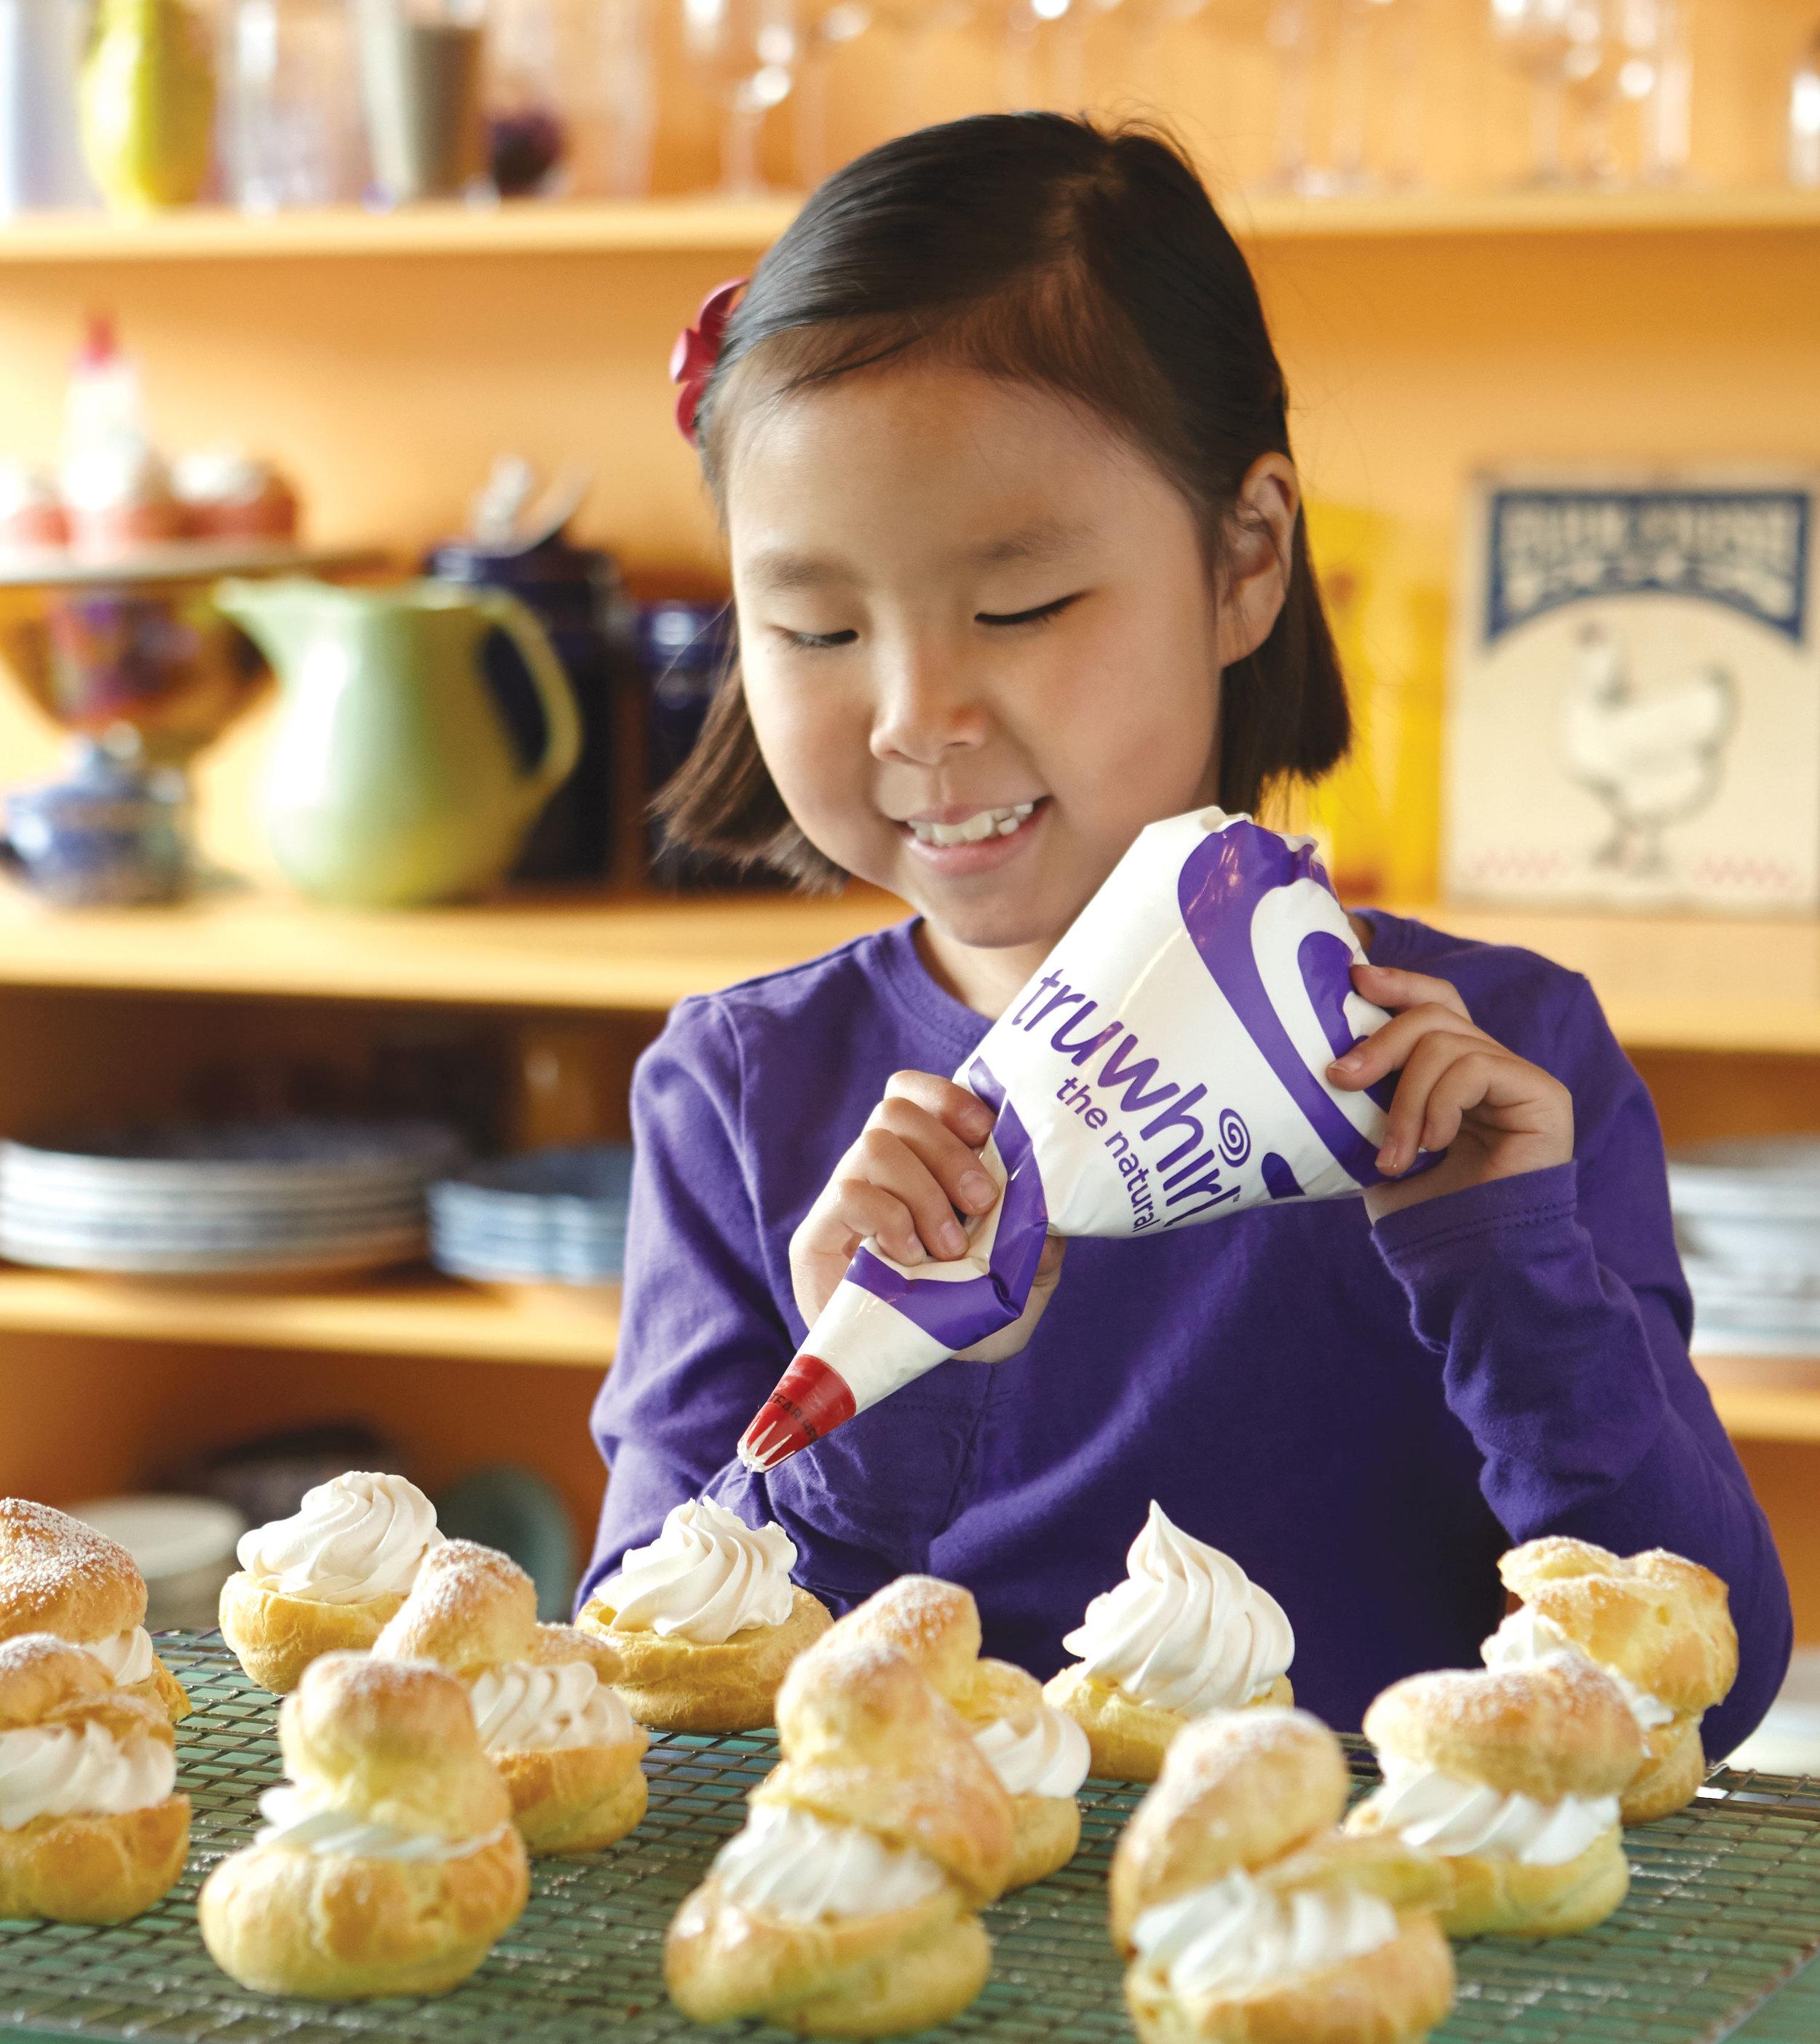 Kid dispensing truwhip on pastry creative advertising